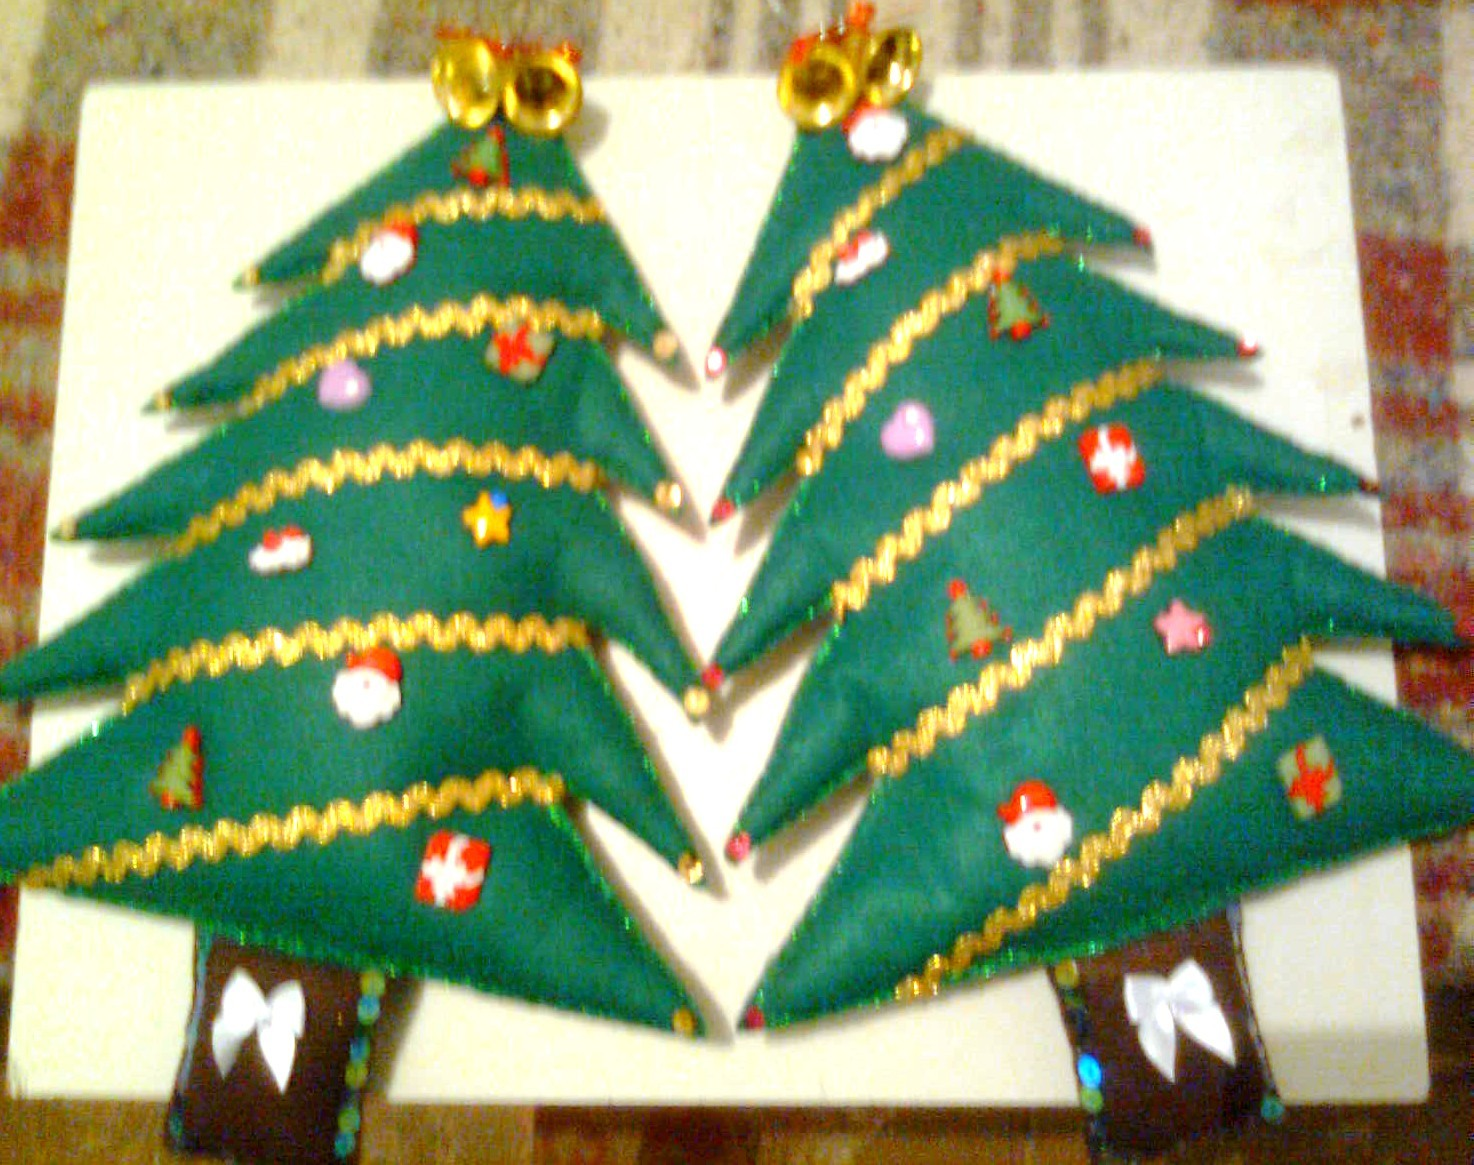 enfeites luminosos de natal para jardim : enfeites luminosos de natal para jardim:Enfeite De Porta Estrela De Natal Enfeite De Porta Estrela De Natal